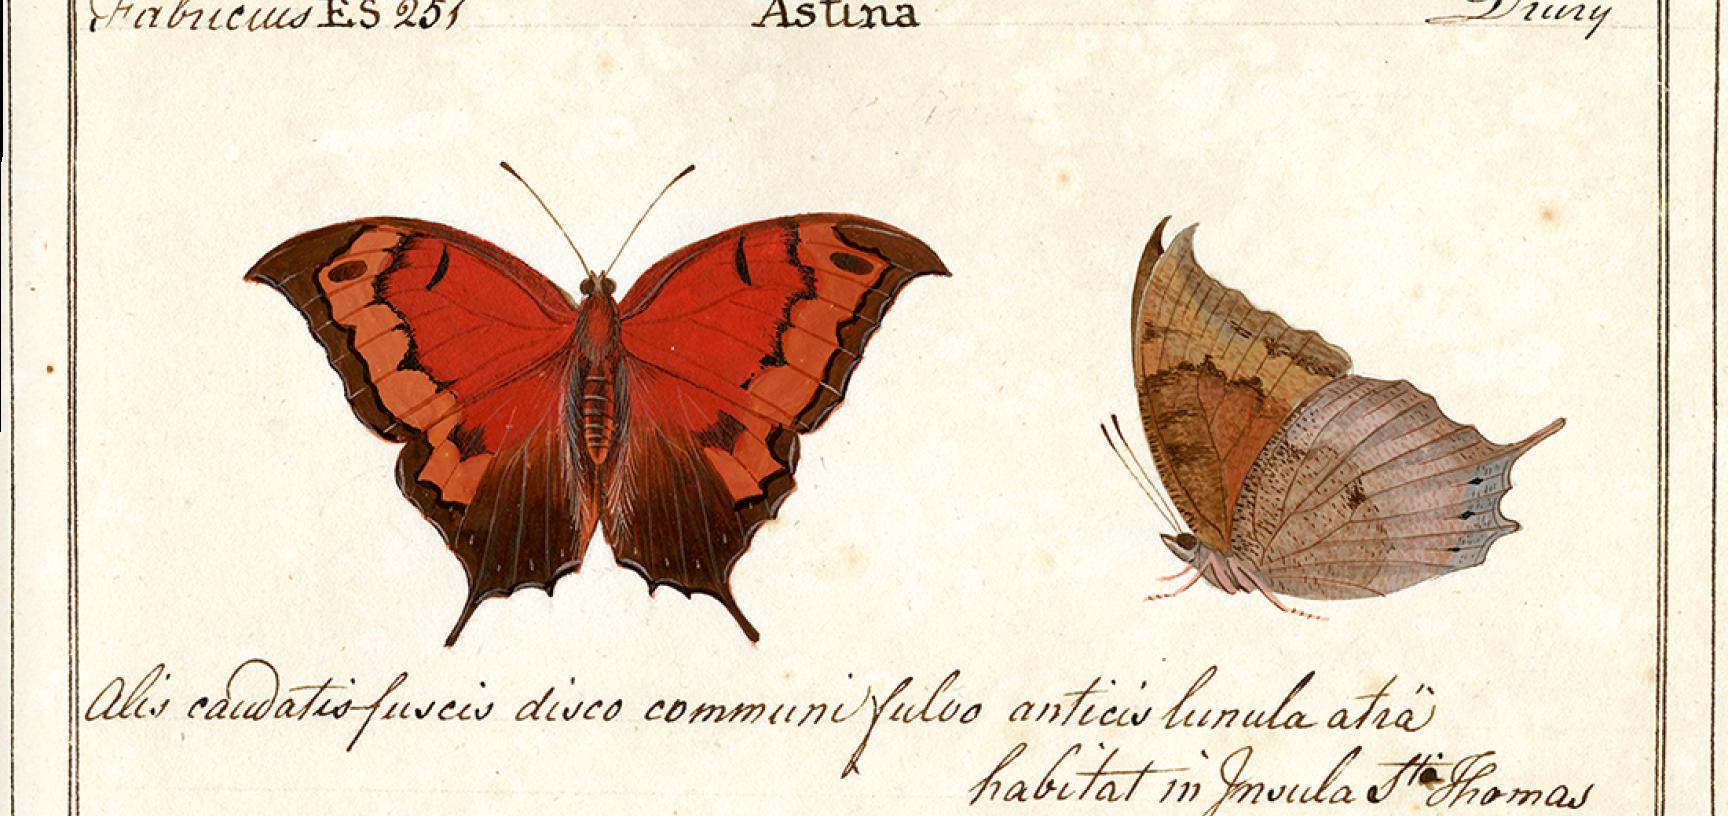 Papilio astina